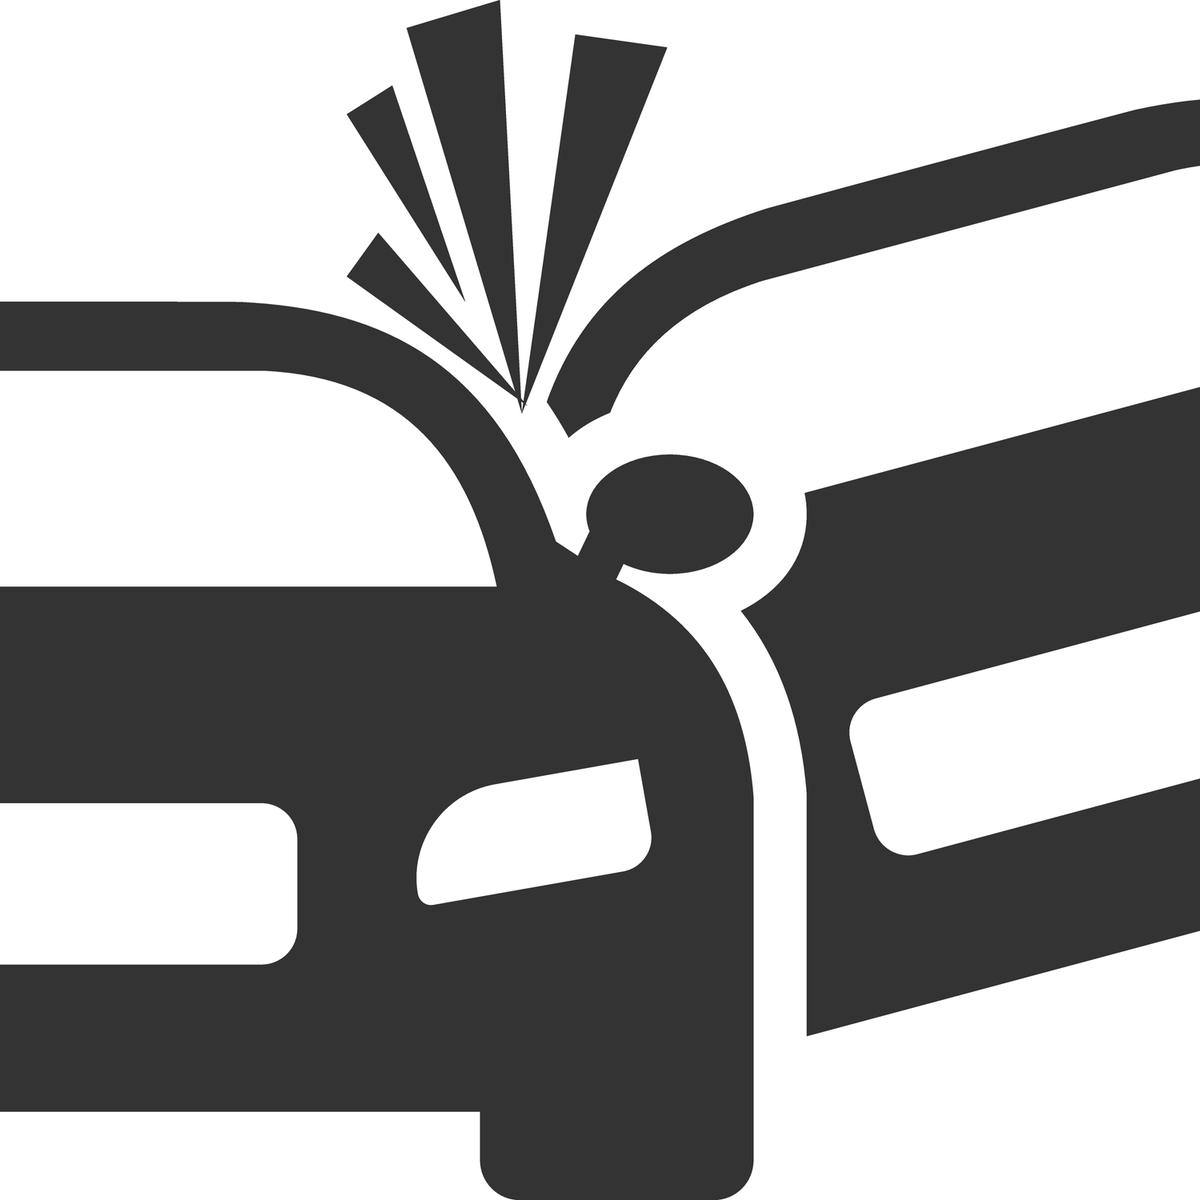 Top 3 Menifee Car Accident Tips